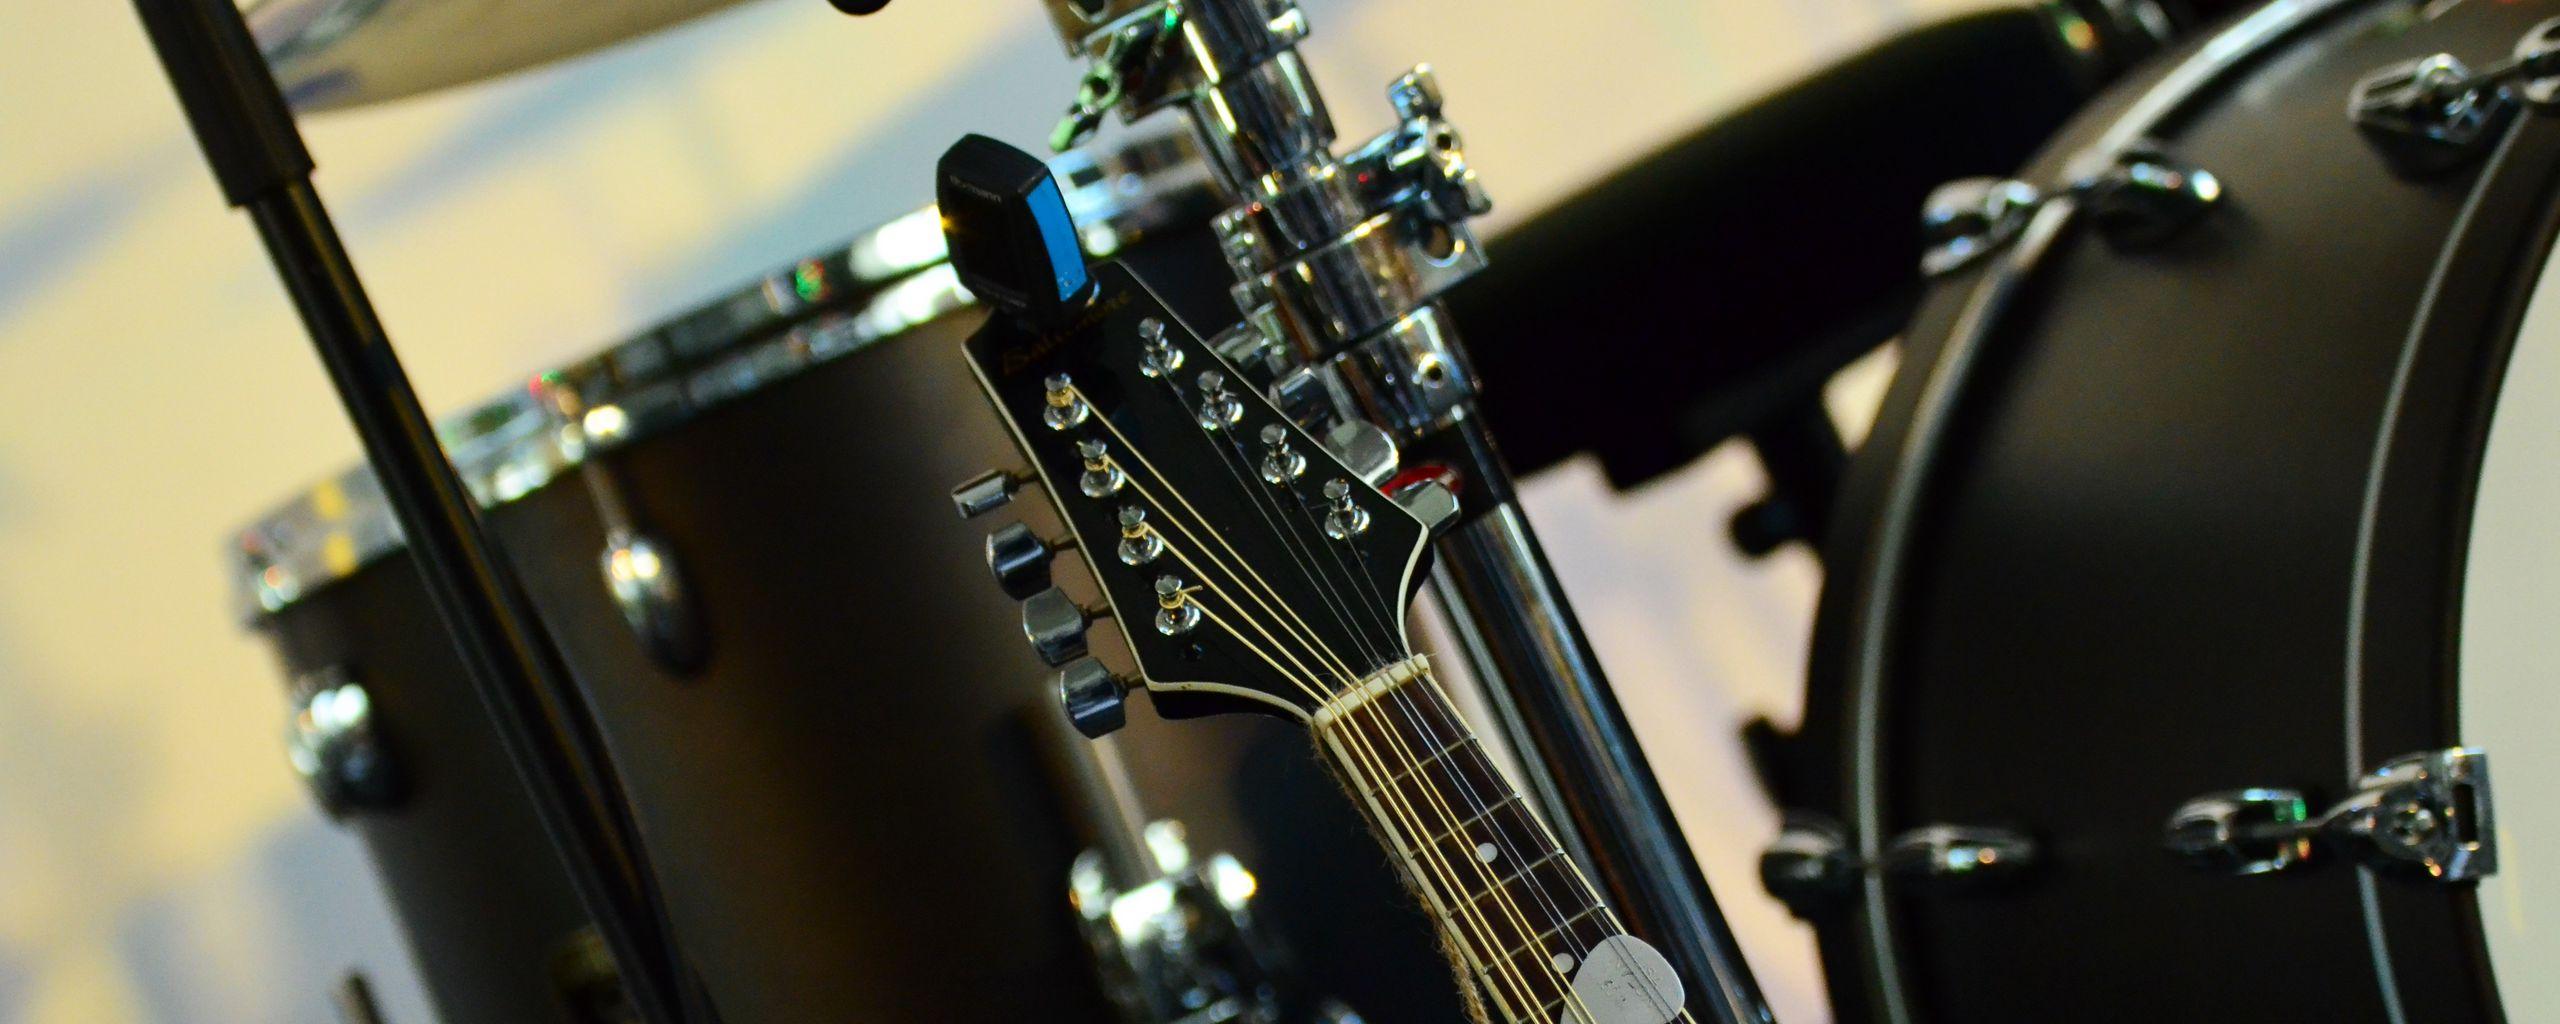 2560x1024 Wallpaper musical instrument, music, percussion, guitar